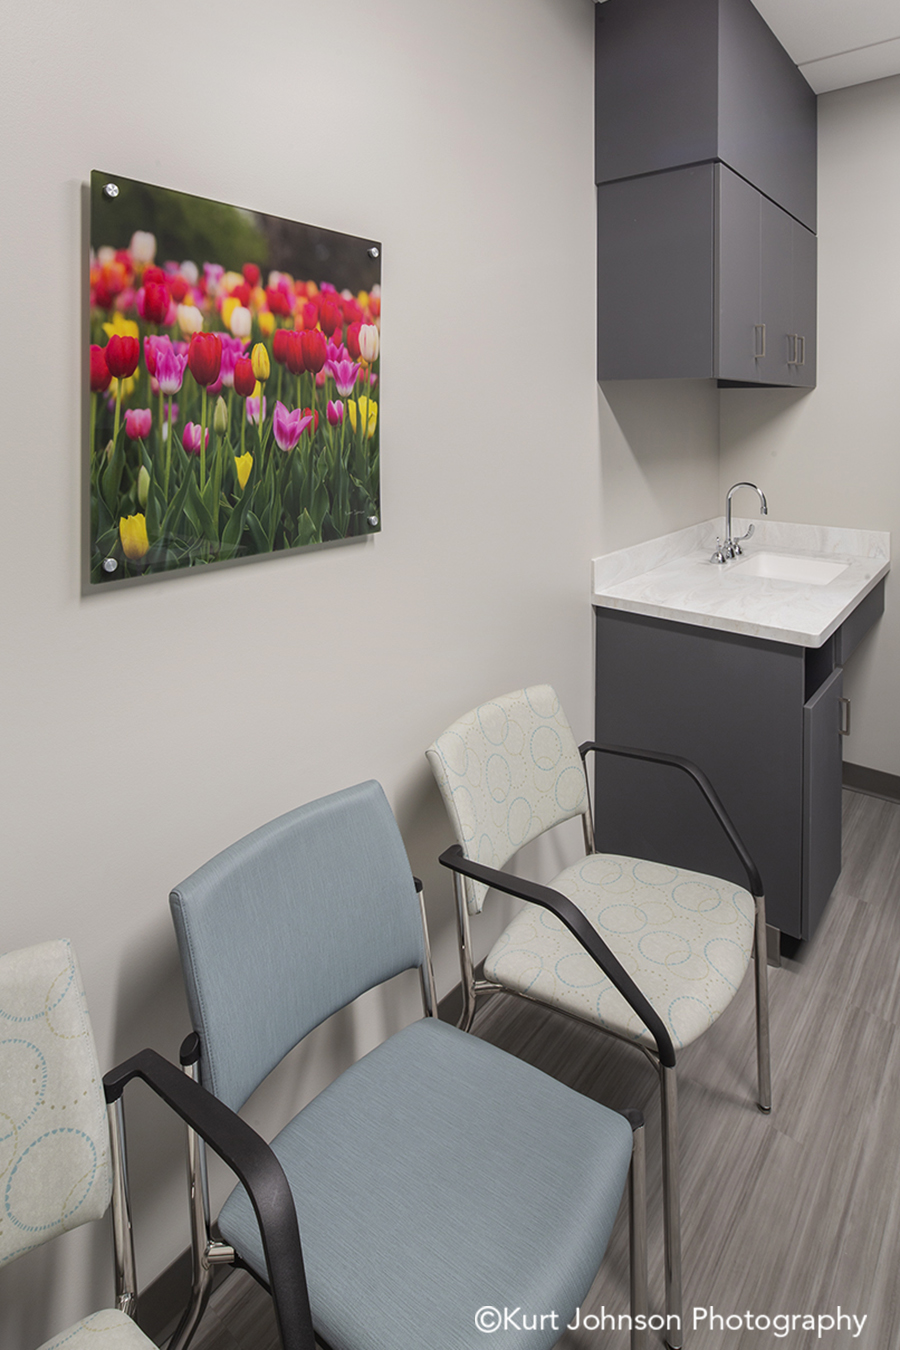 acrylic panel install healthcare installation tulips flowers botanical CHI St Saint Francis Grand Island Nebraska clinic cancer treatment patient room